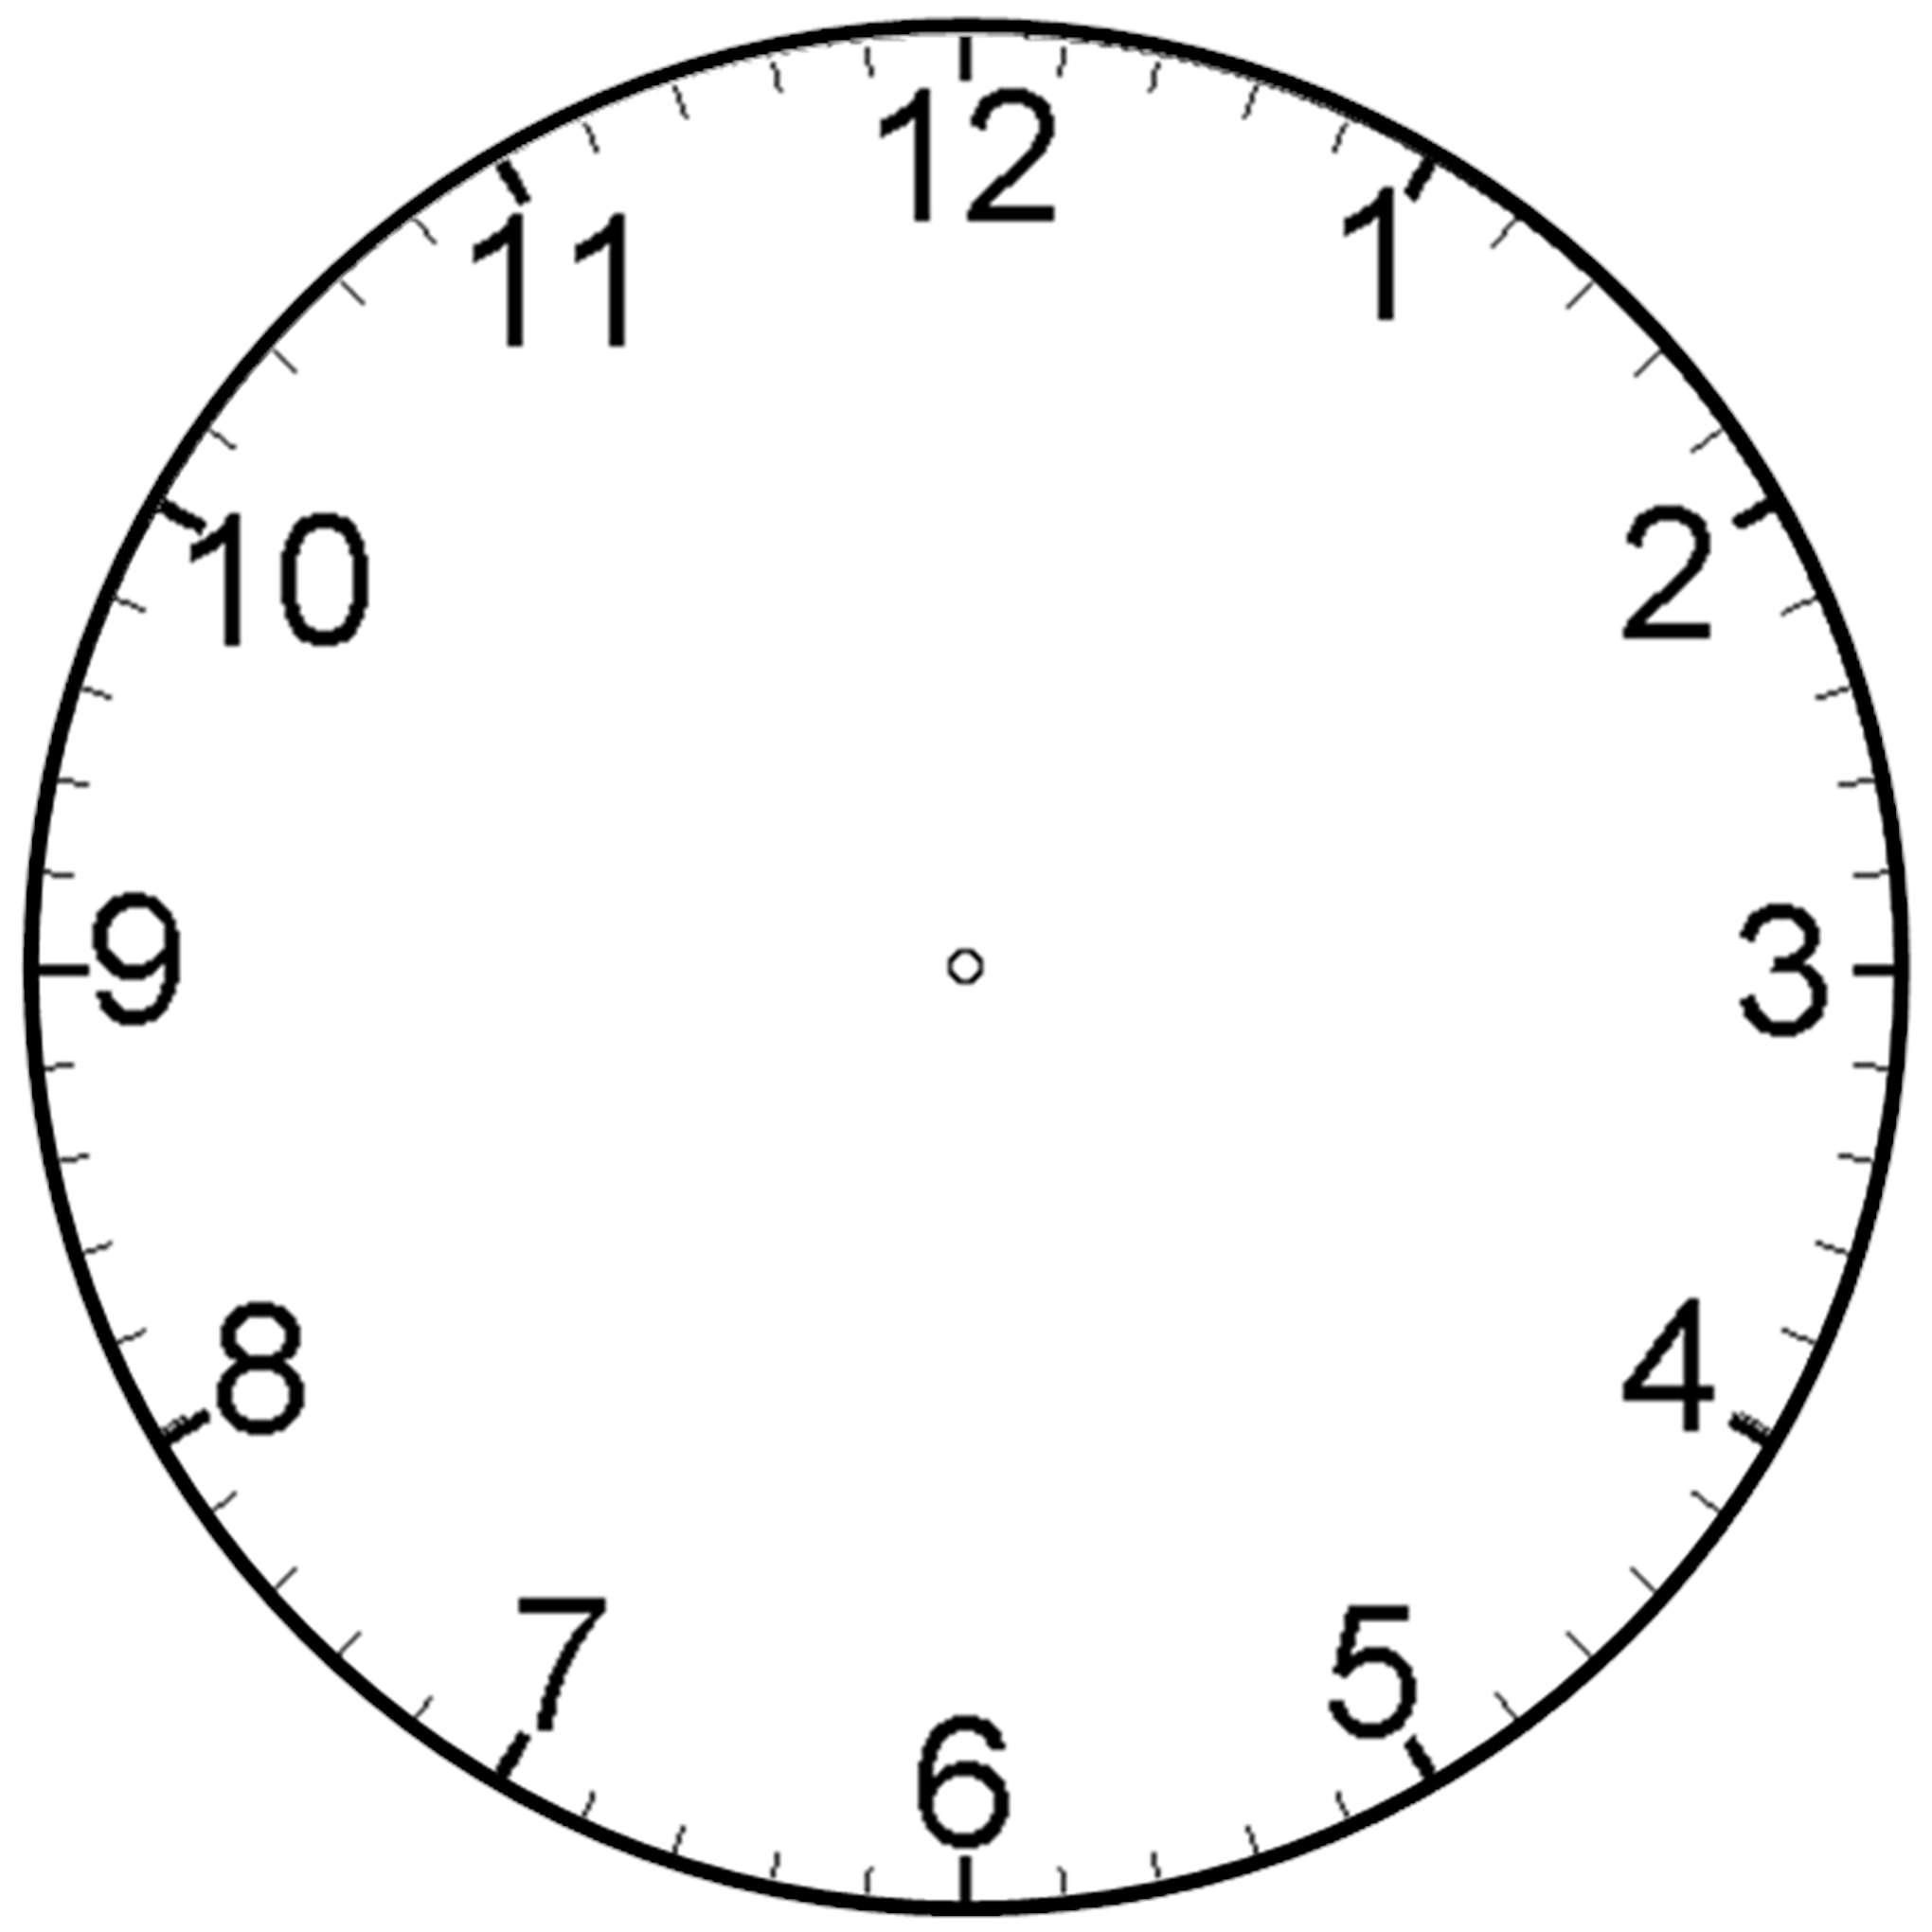 blank clock clipart - Blank Clock Clipart